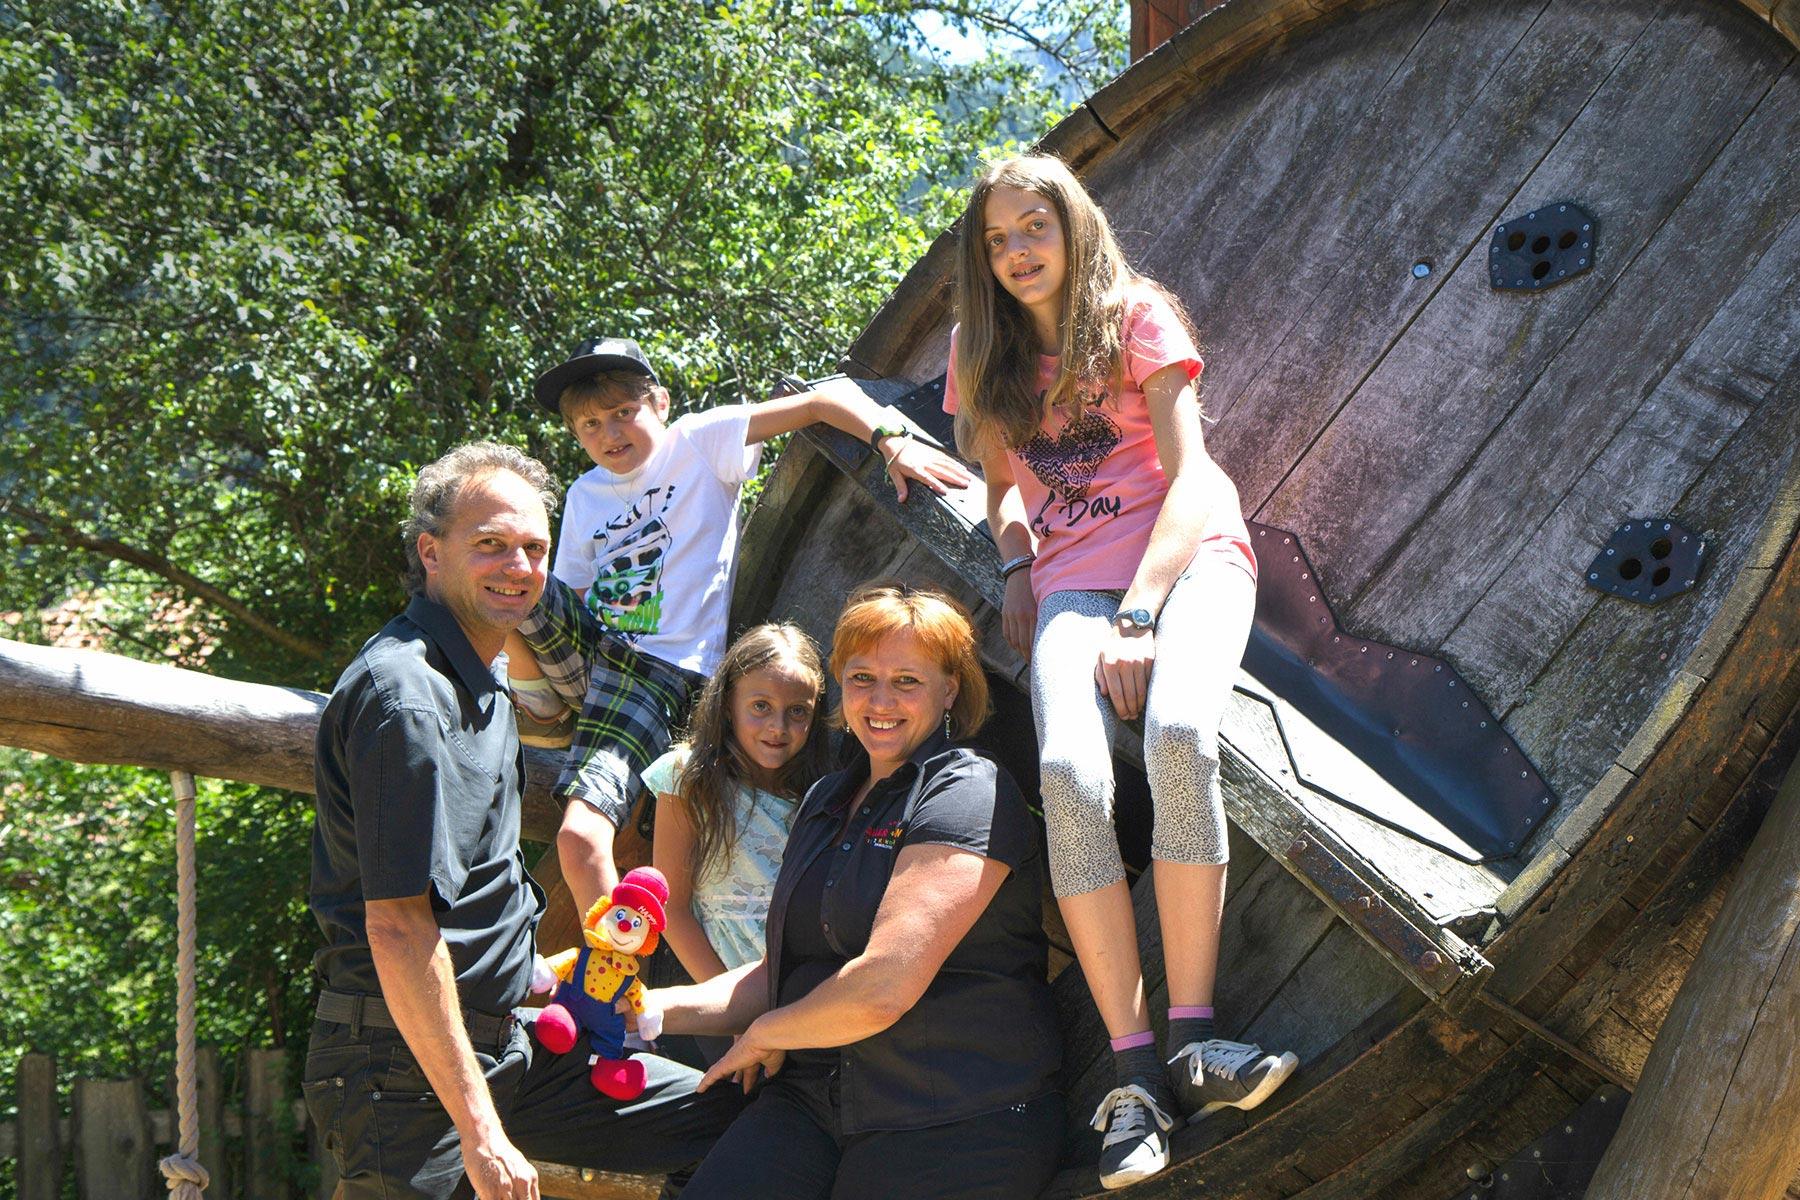 https://www.sailer-und-stefan.at/sites/default/files/revslider/image/Familienfotos_170626-36-1800.jpg